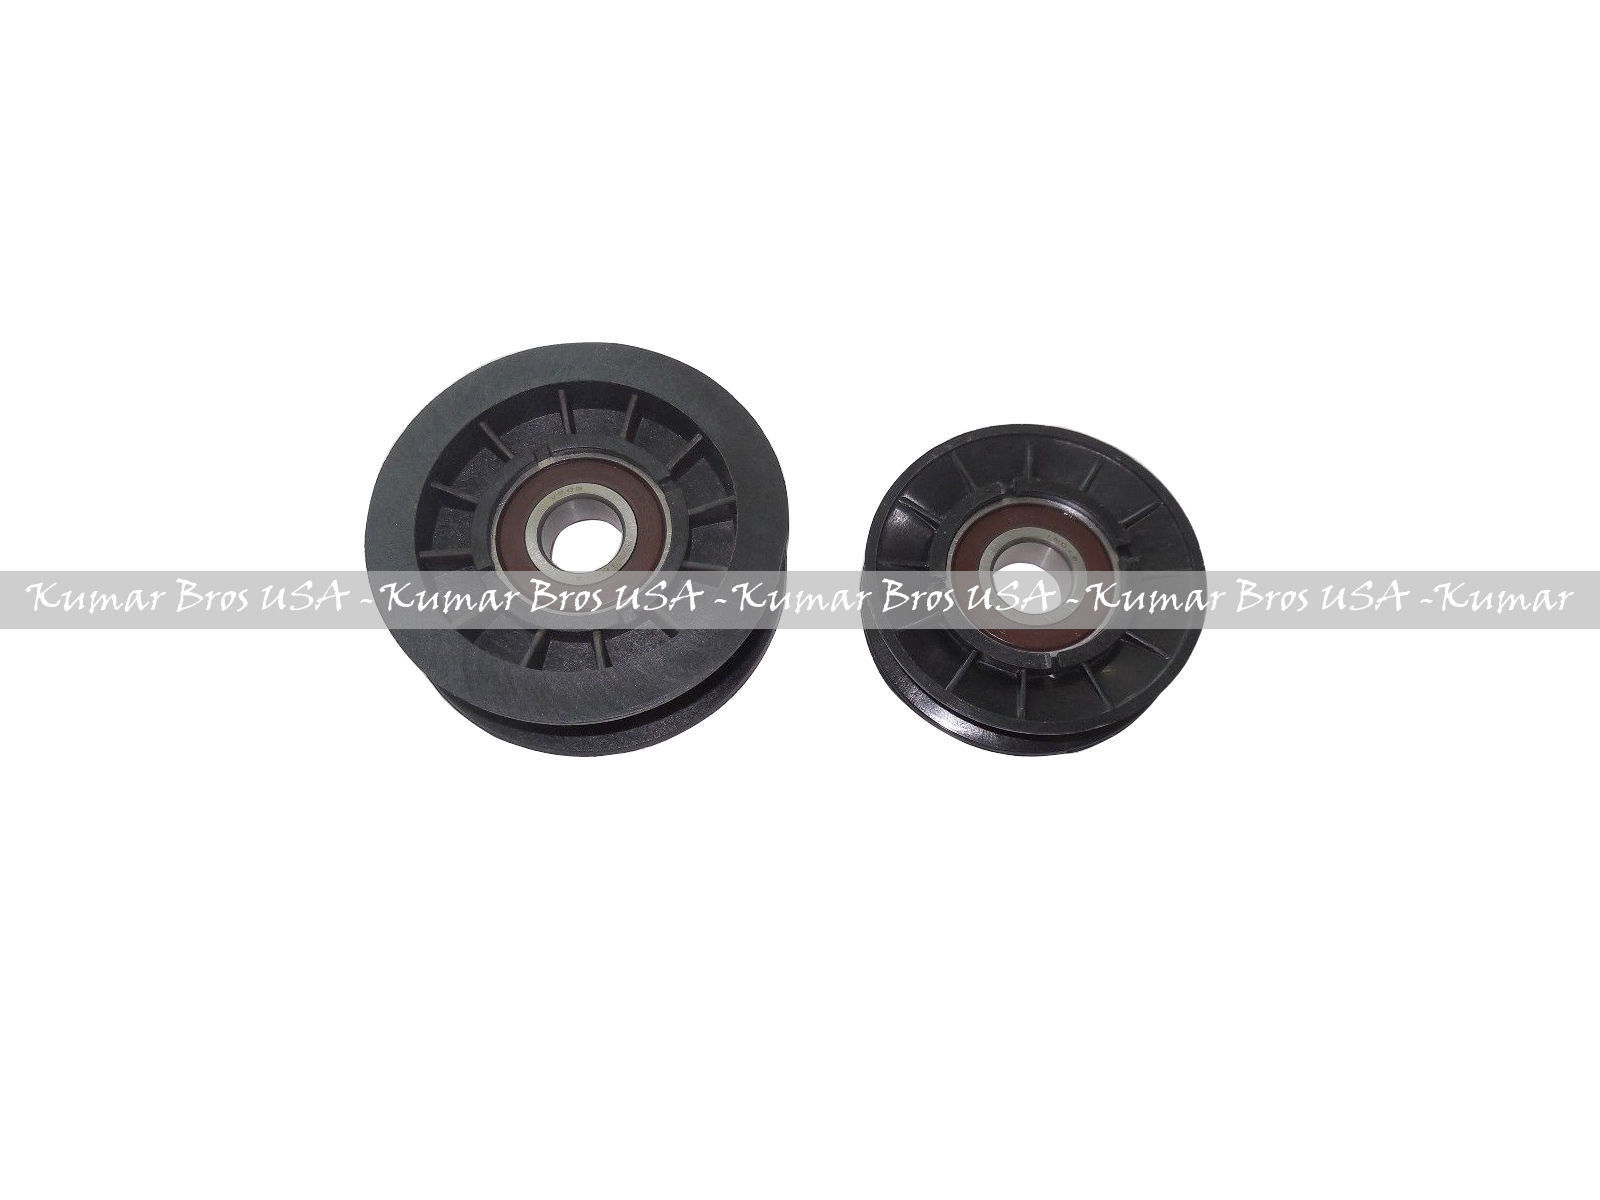 New Idler Pulley Kit for transmission belt Fits John Deere LA140 LA145 LA150